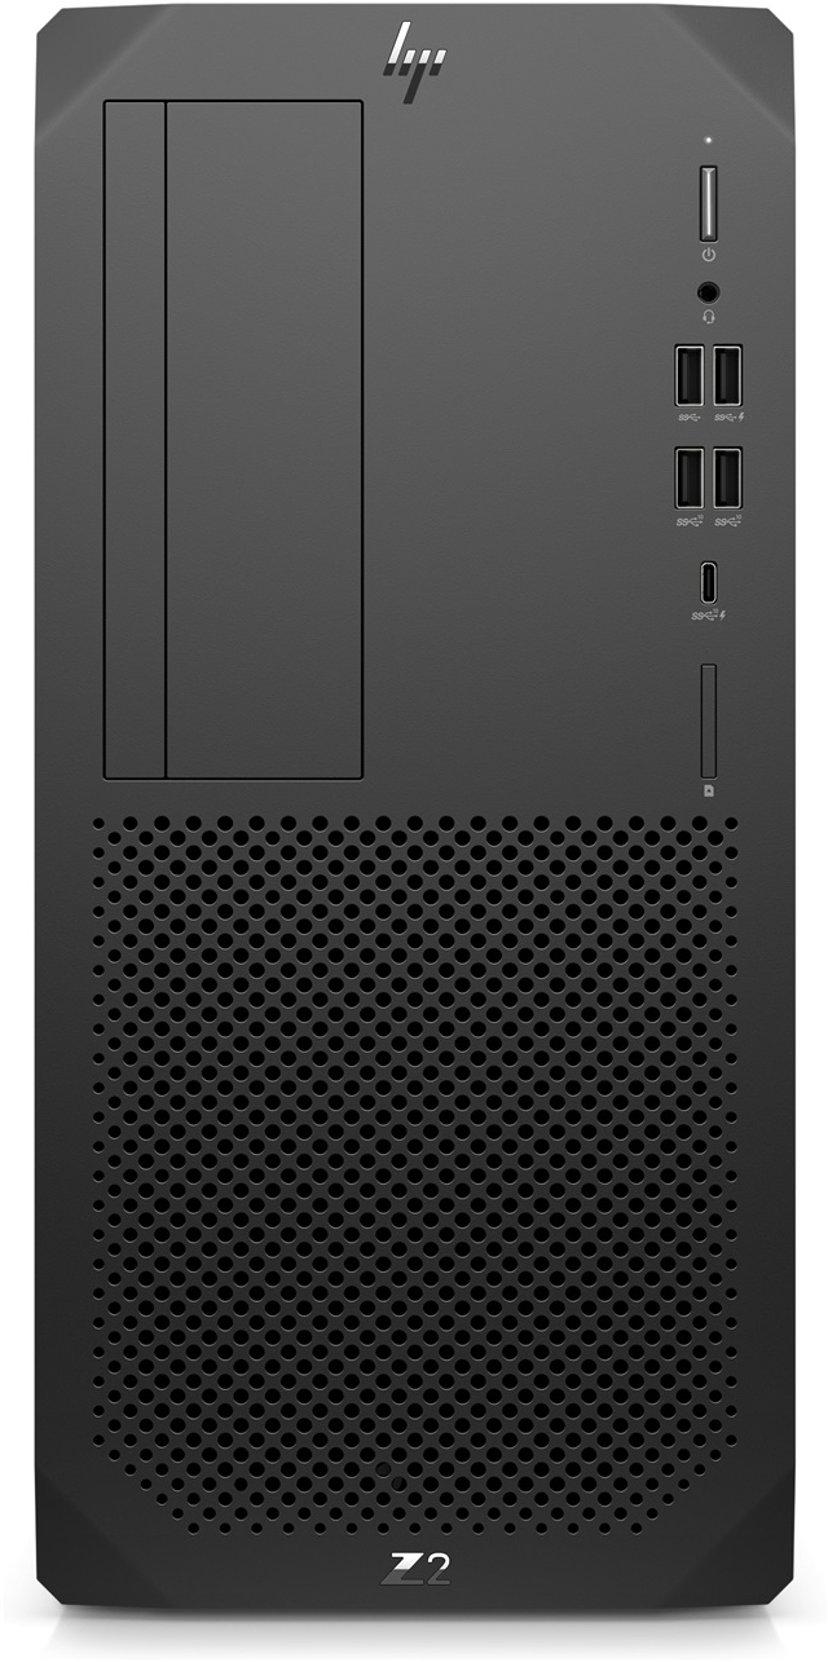 HP Z2 G5 Tower Core i7 32GB 1000GB SSD